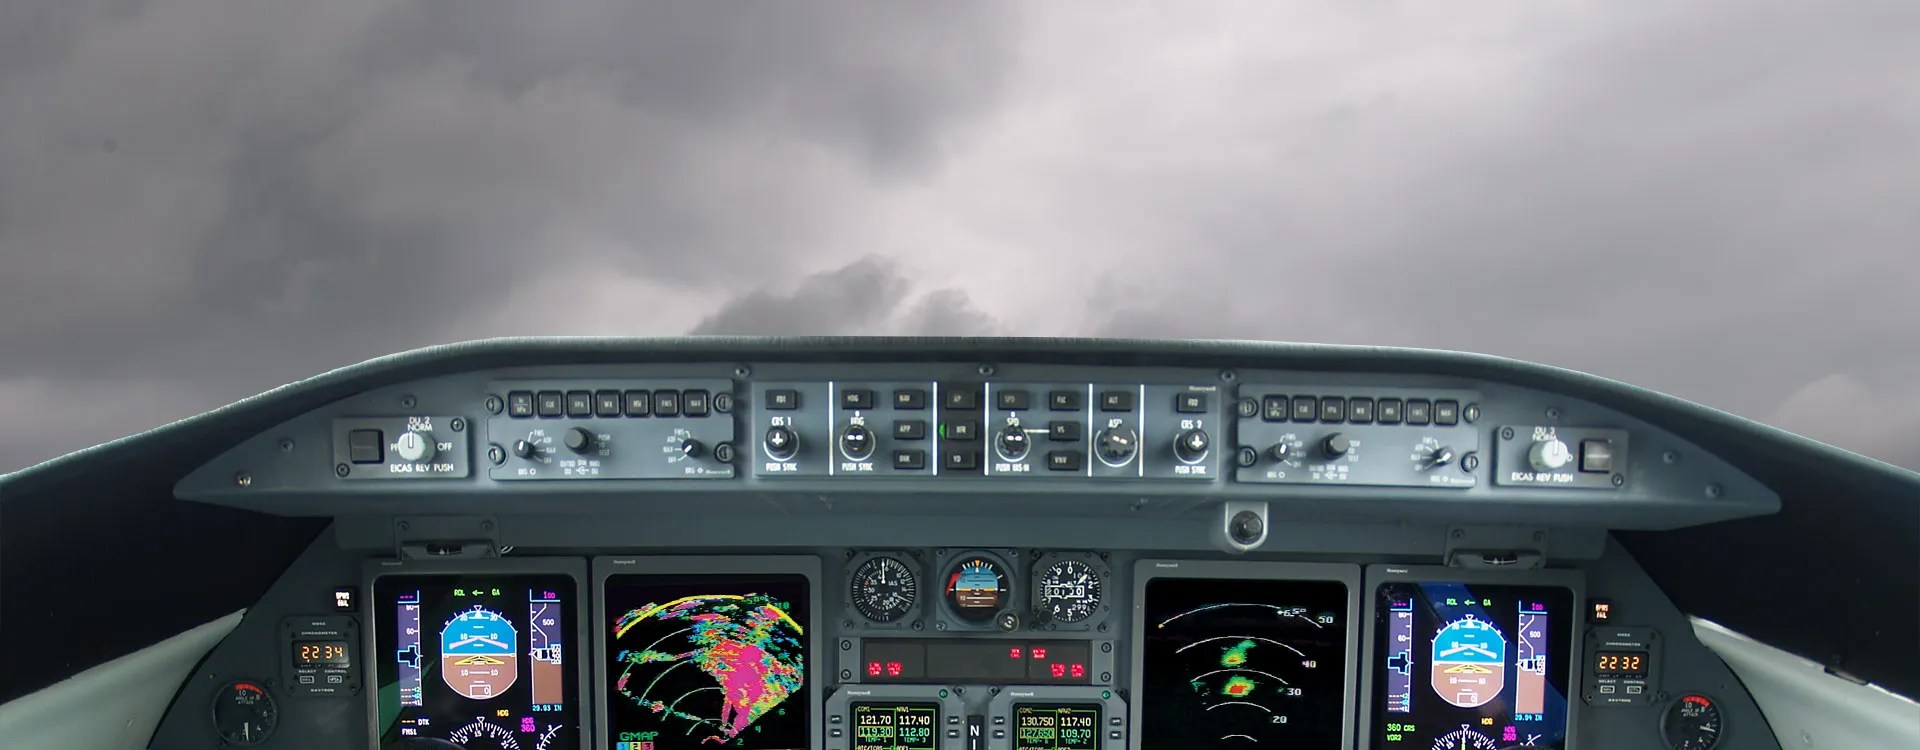 primus 880 weather radar manual